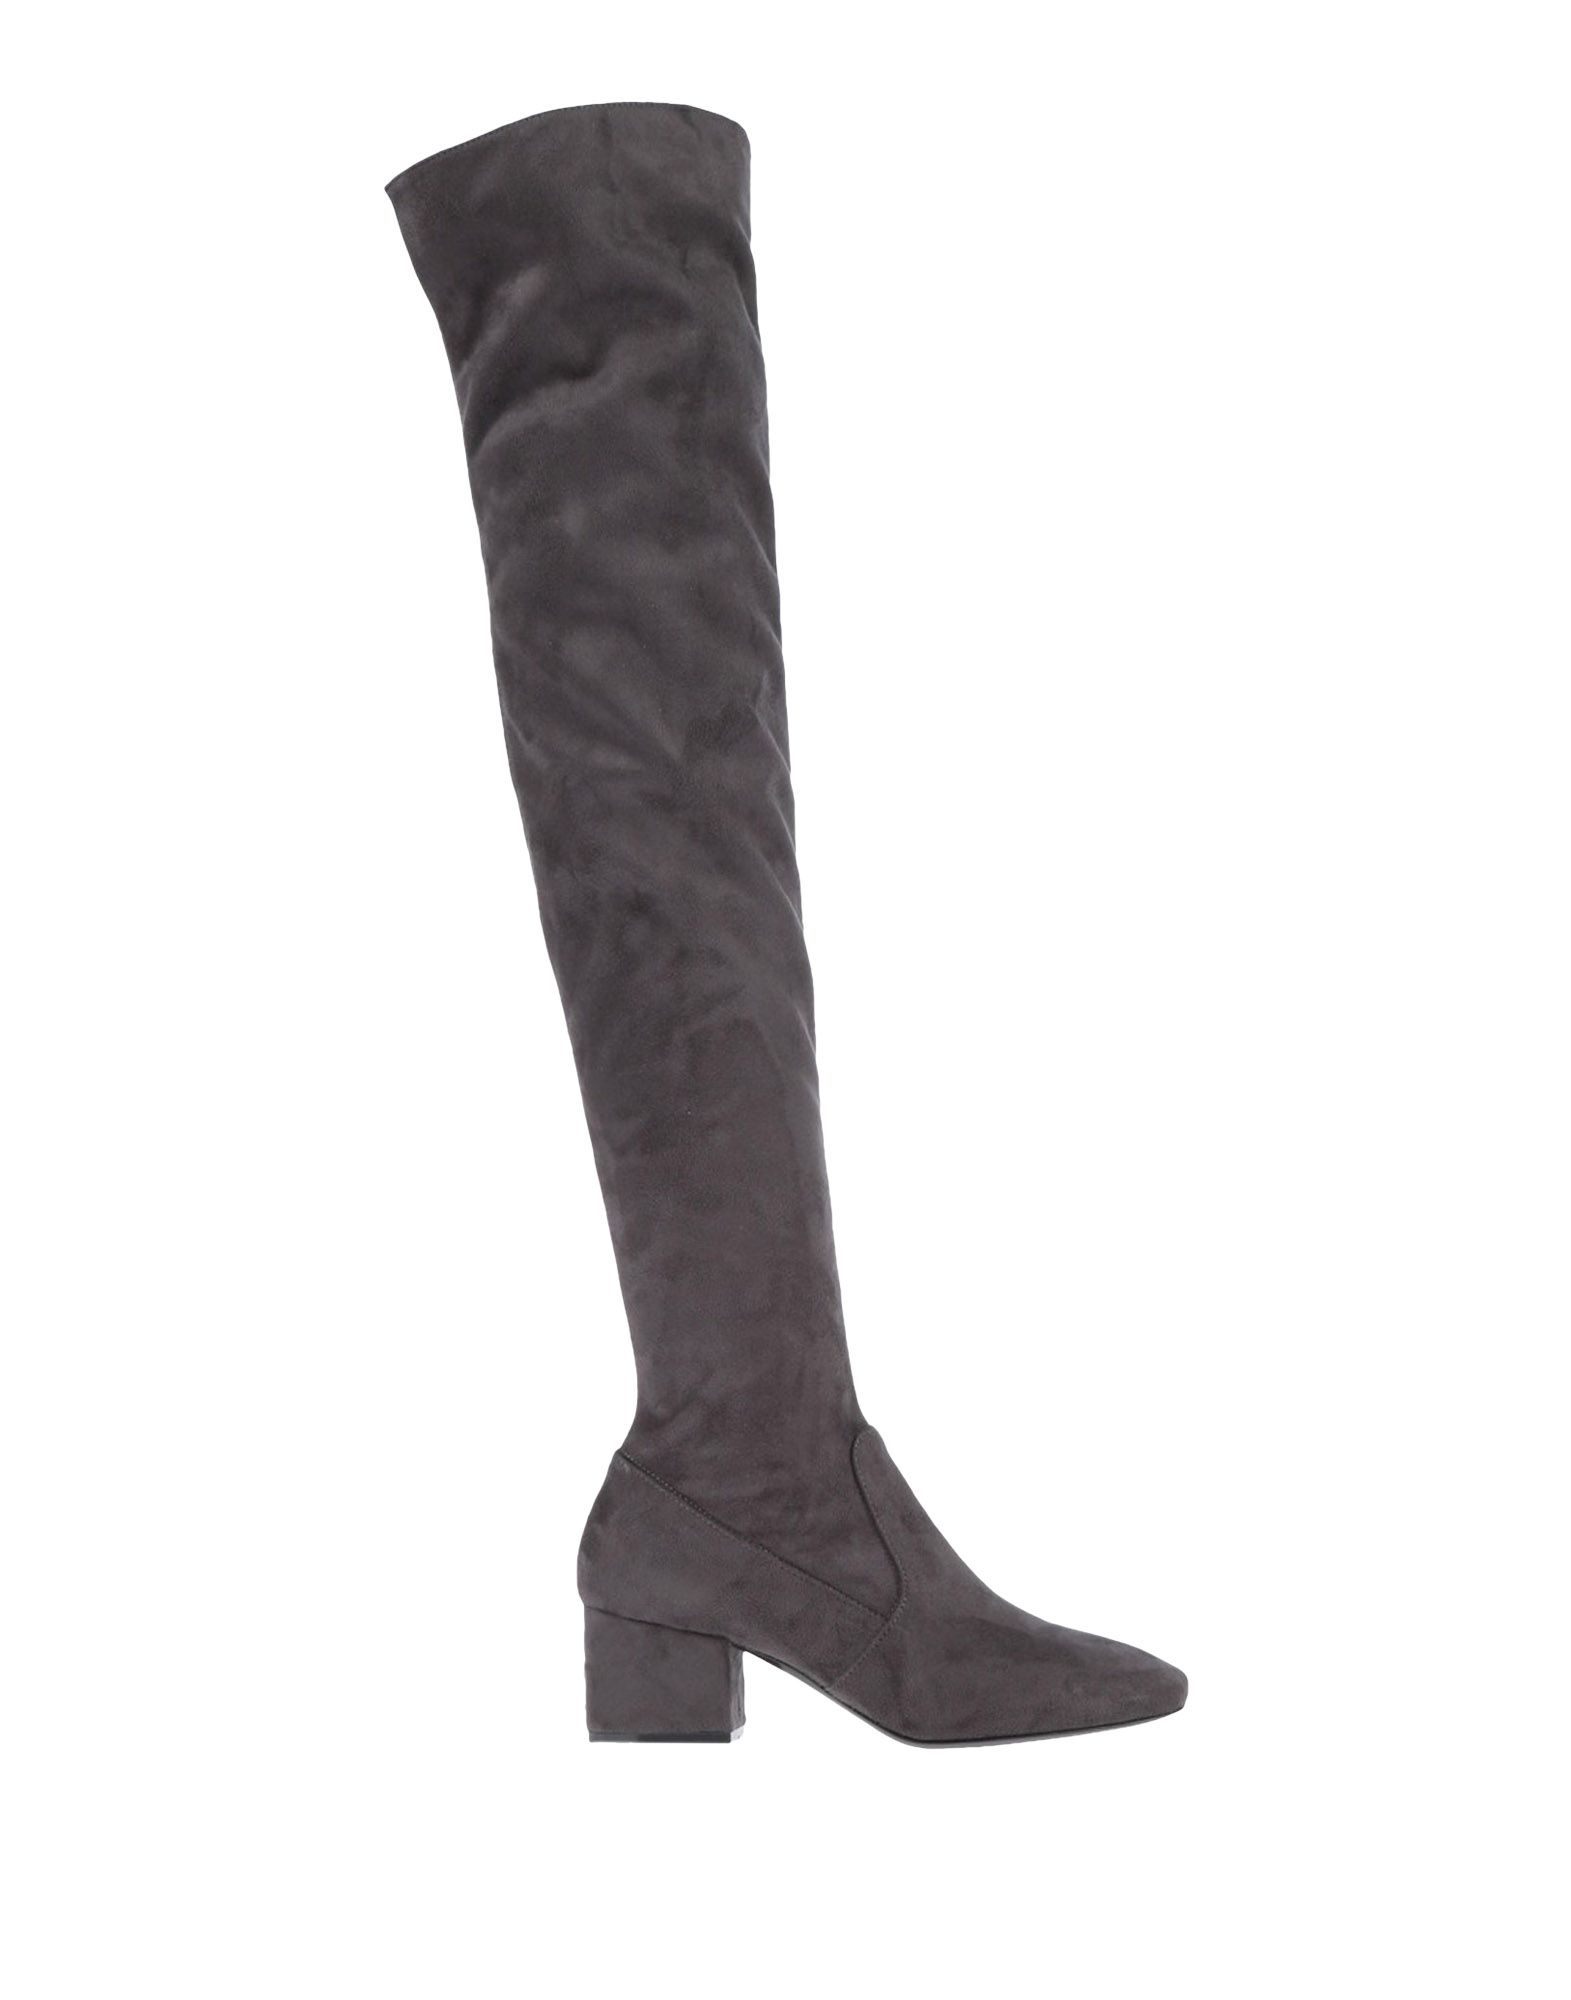 Liviana on Conti Boots - Women Liviana Conti Boots online on Liviana  Canada - 11533005QQ 65f0e0